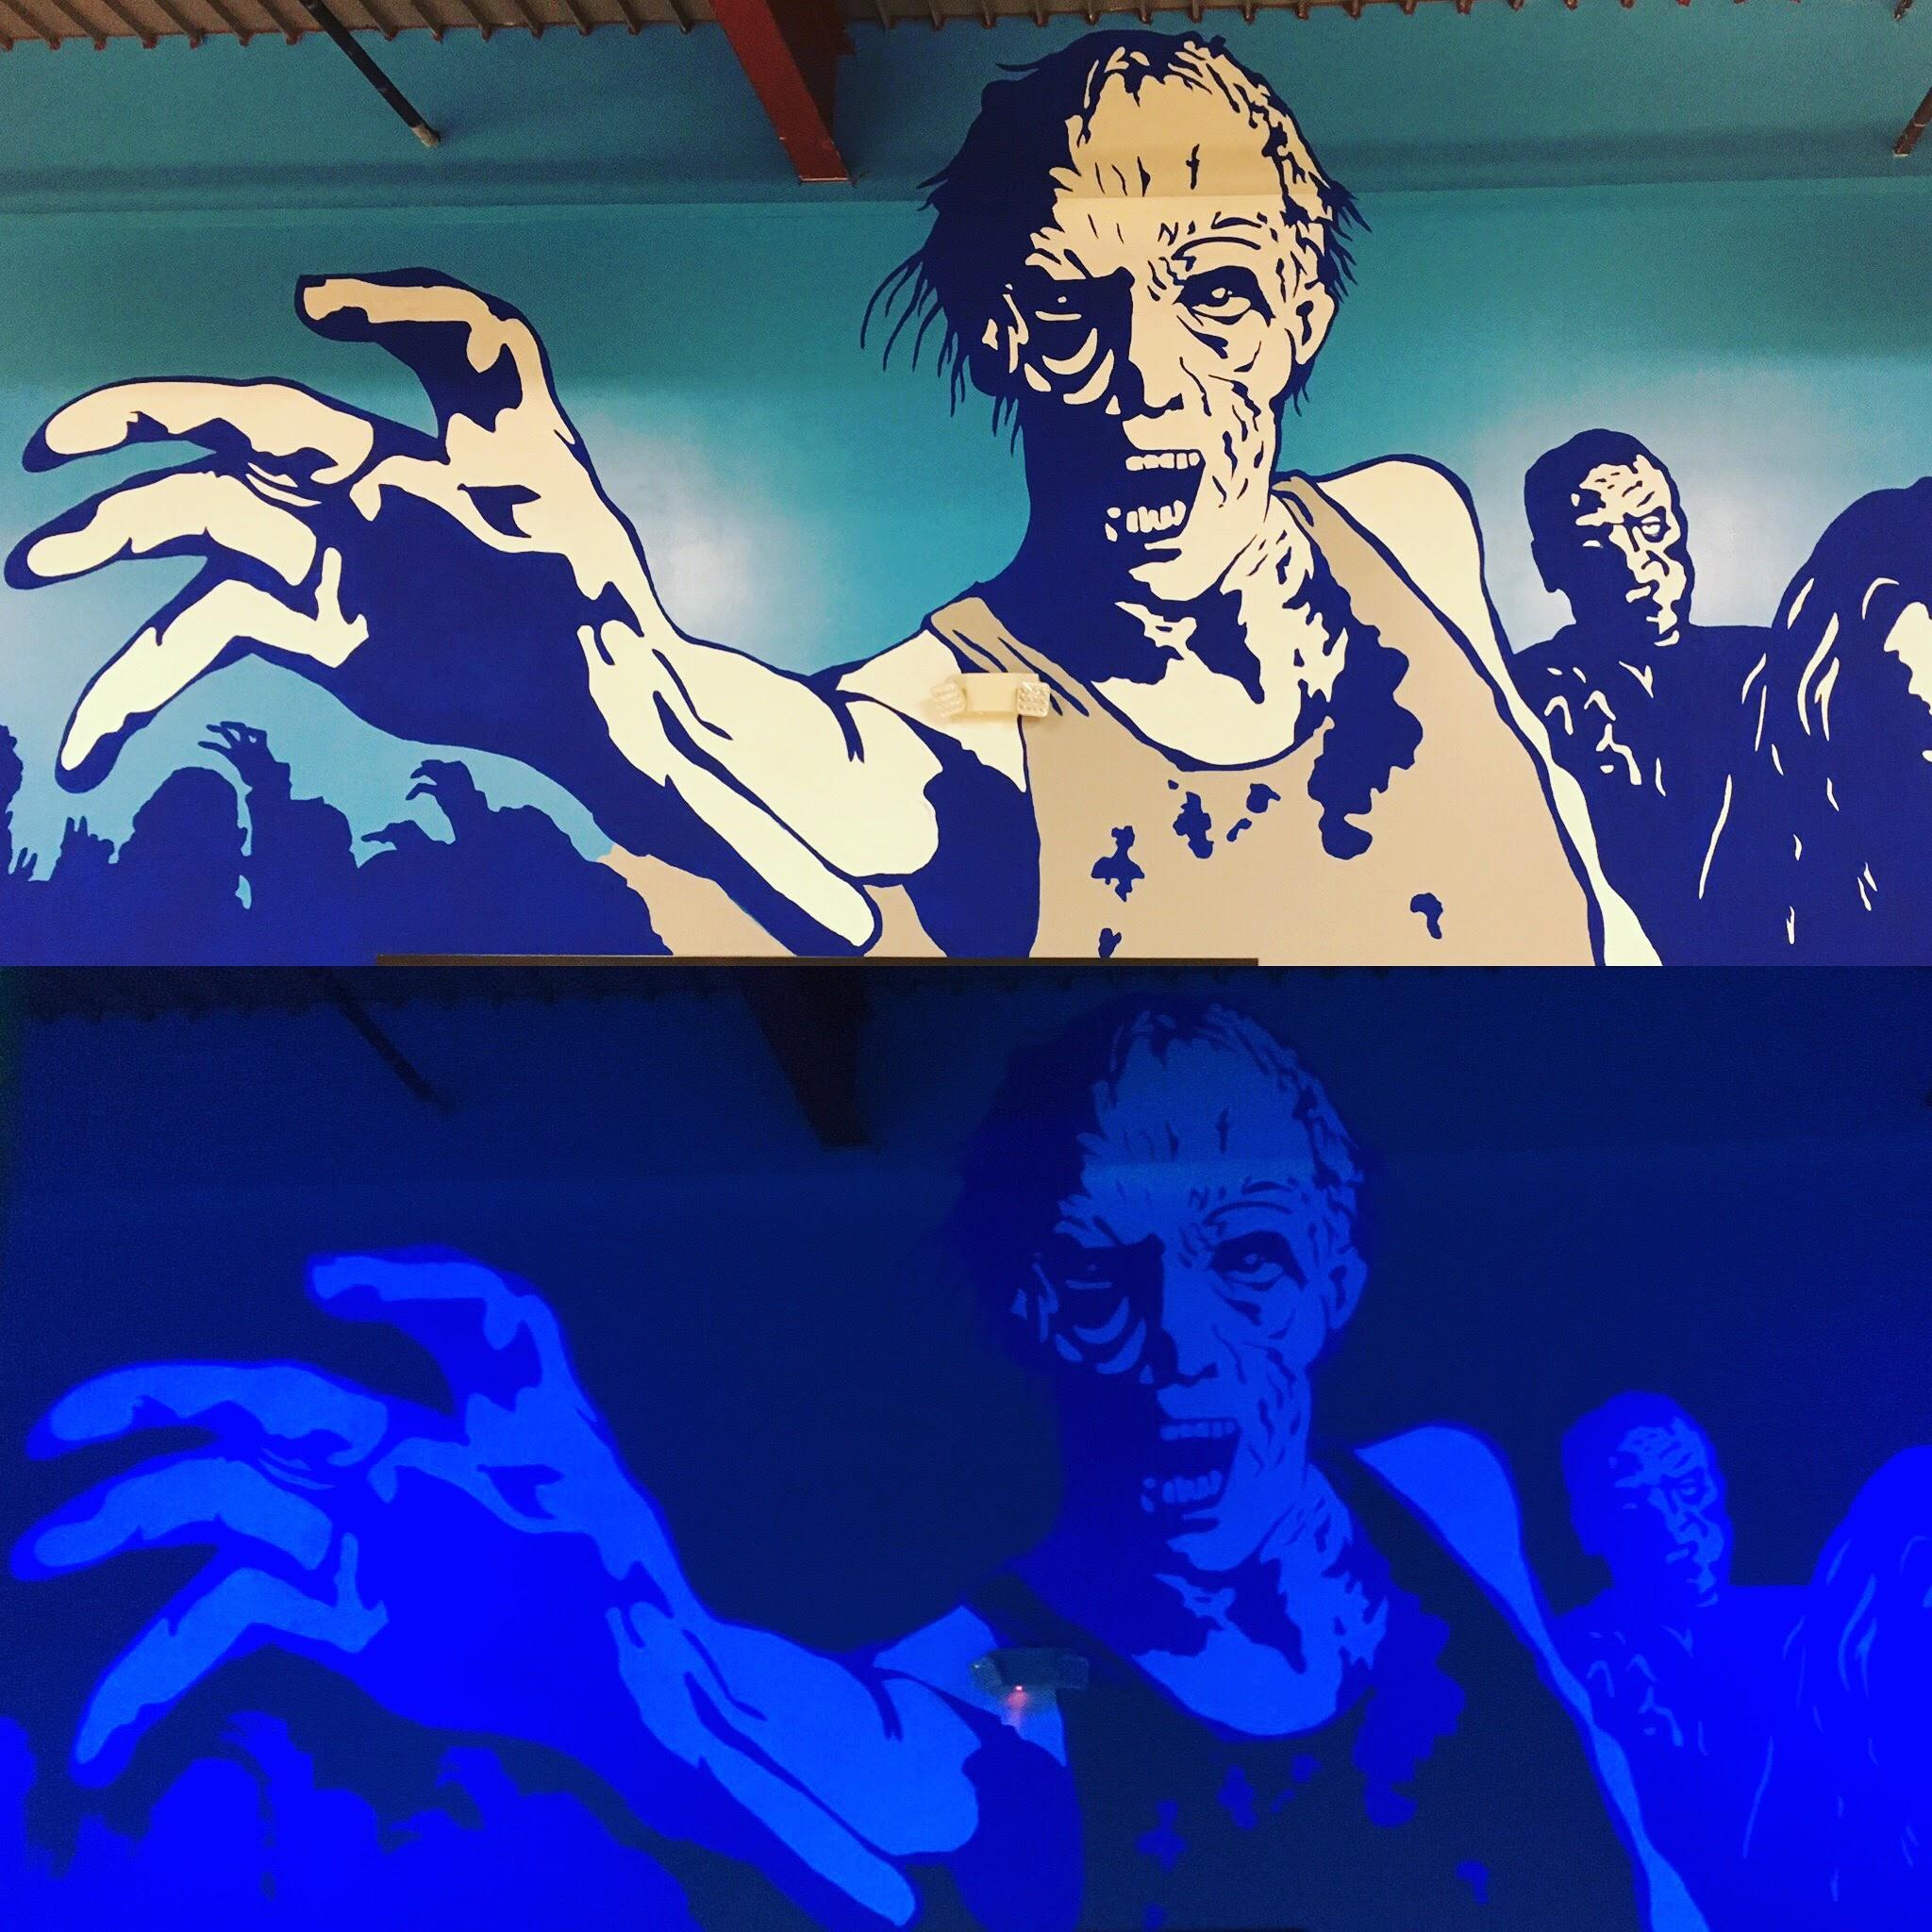 Dart'Em Up Nerf Gun Arena Blacklight Zombie Mural, Austin